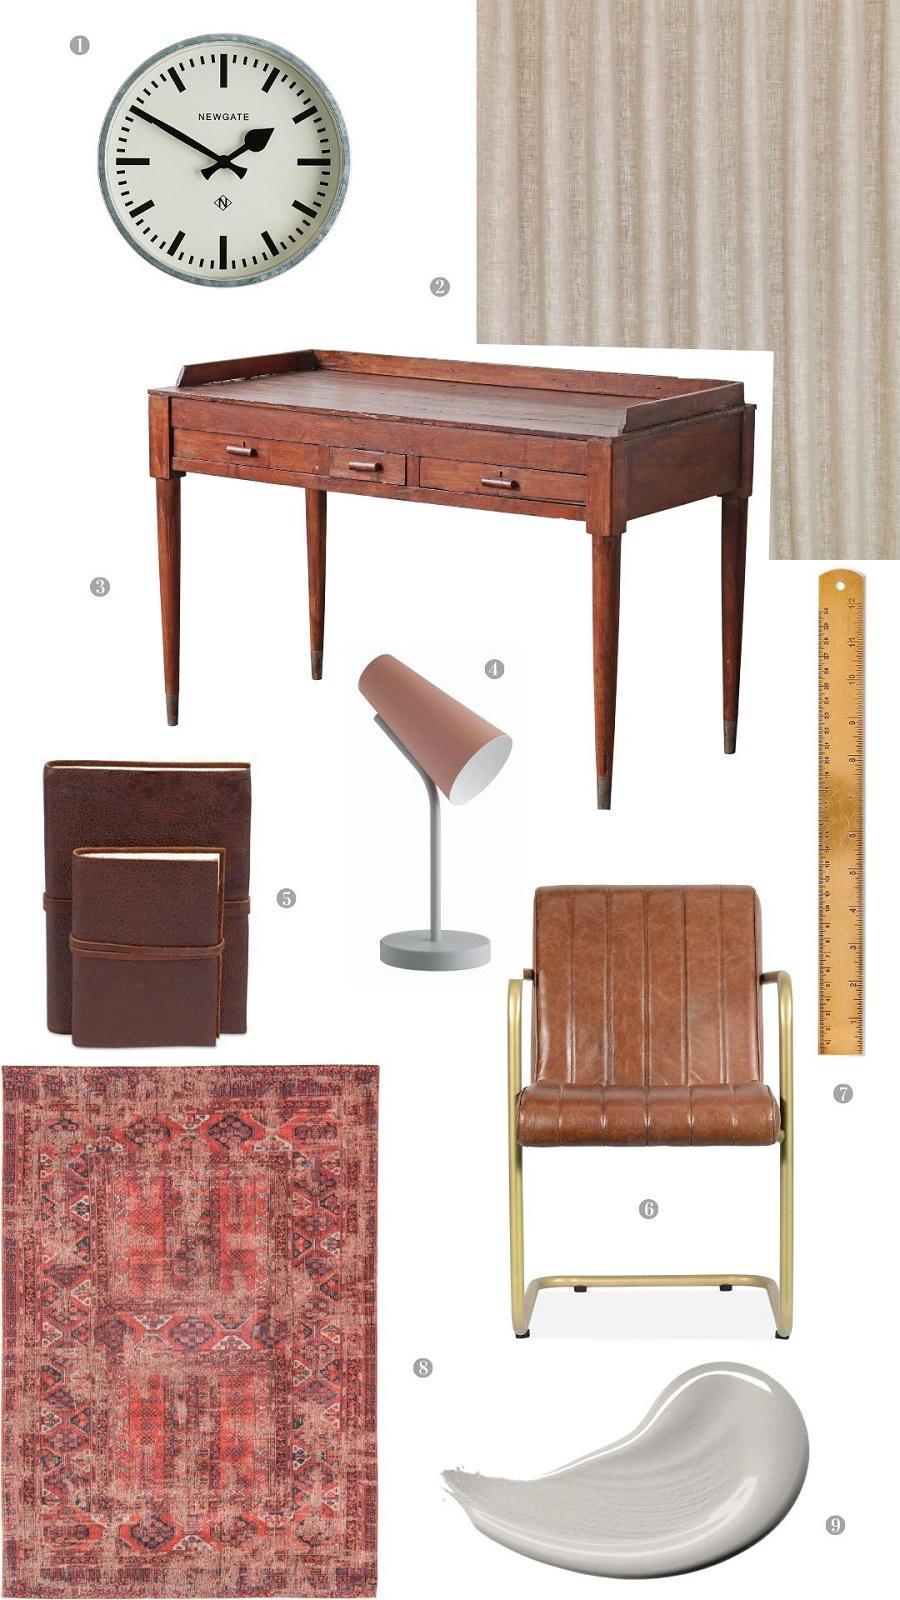 A Simple Vintage Inspired Workspace - Get The Look